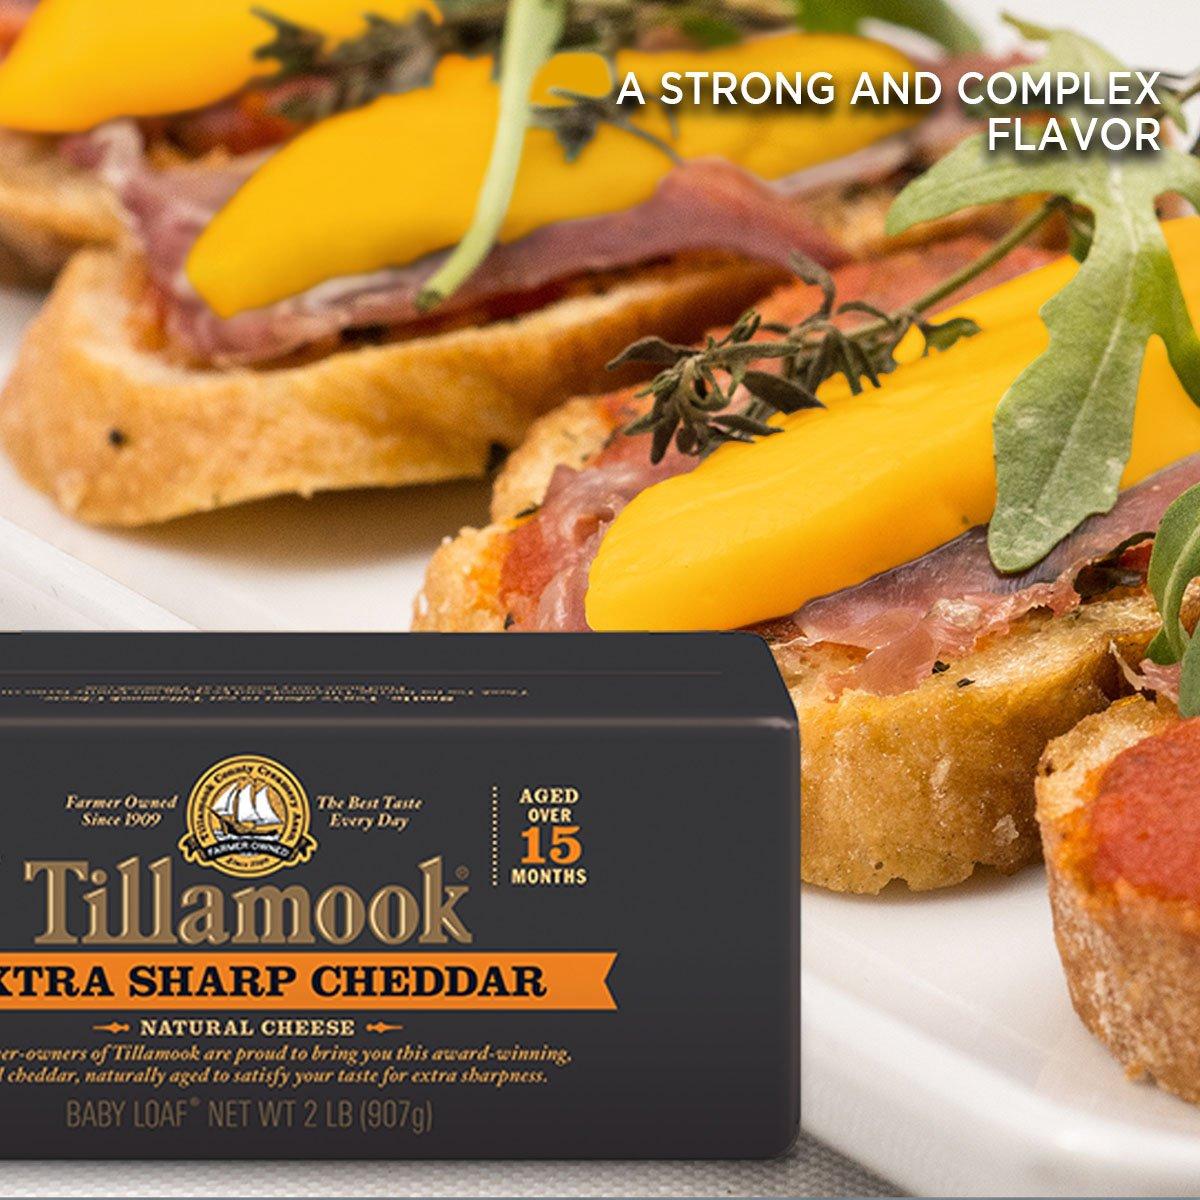 Tillamook Cheese 2lb Baby Loaf (Choose Flavor Below) (Extra Sharp Cheddar)